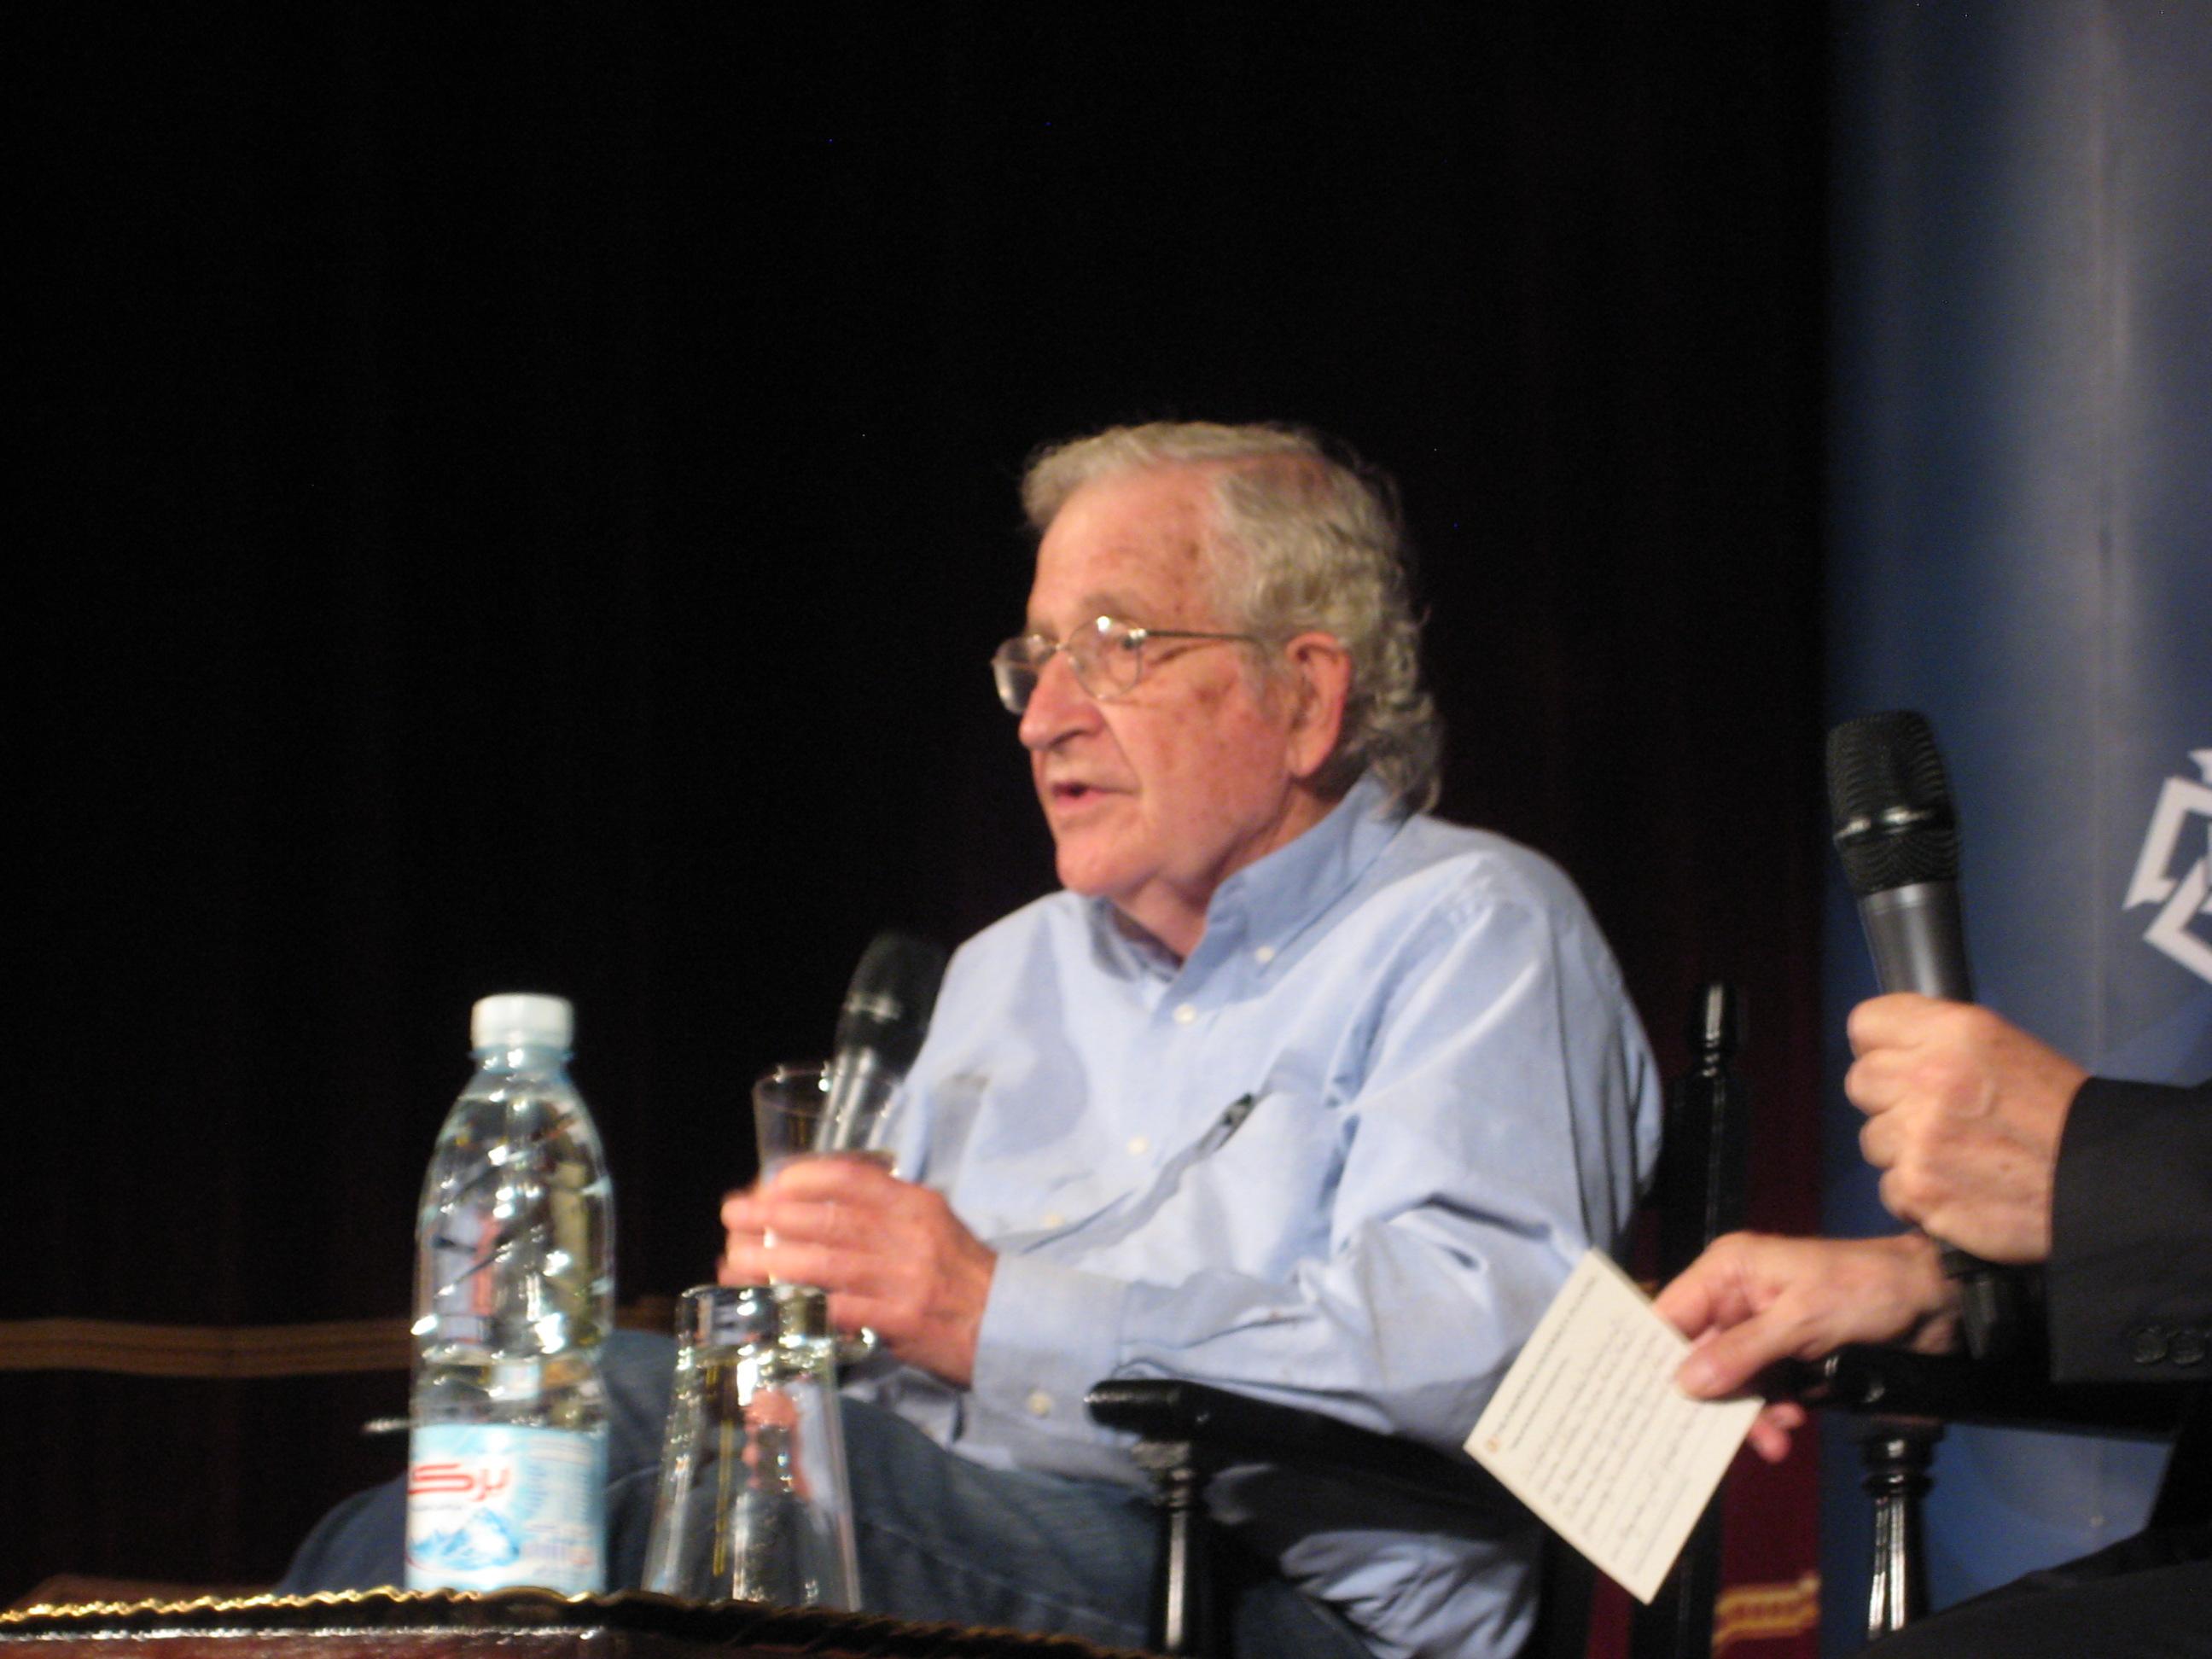 Noam Chomsky addressing the crowd at the American University in Cairo Luiz Sanchez / DNE